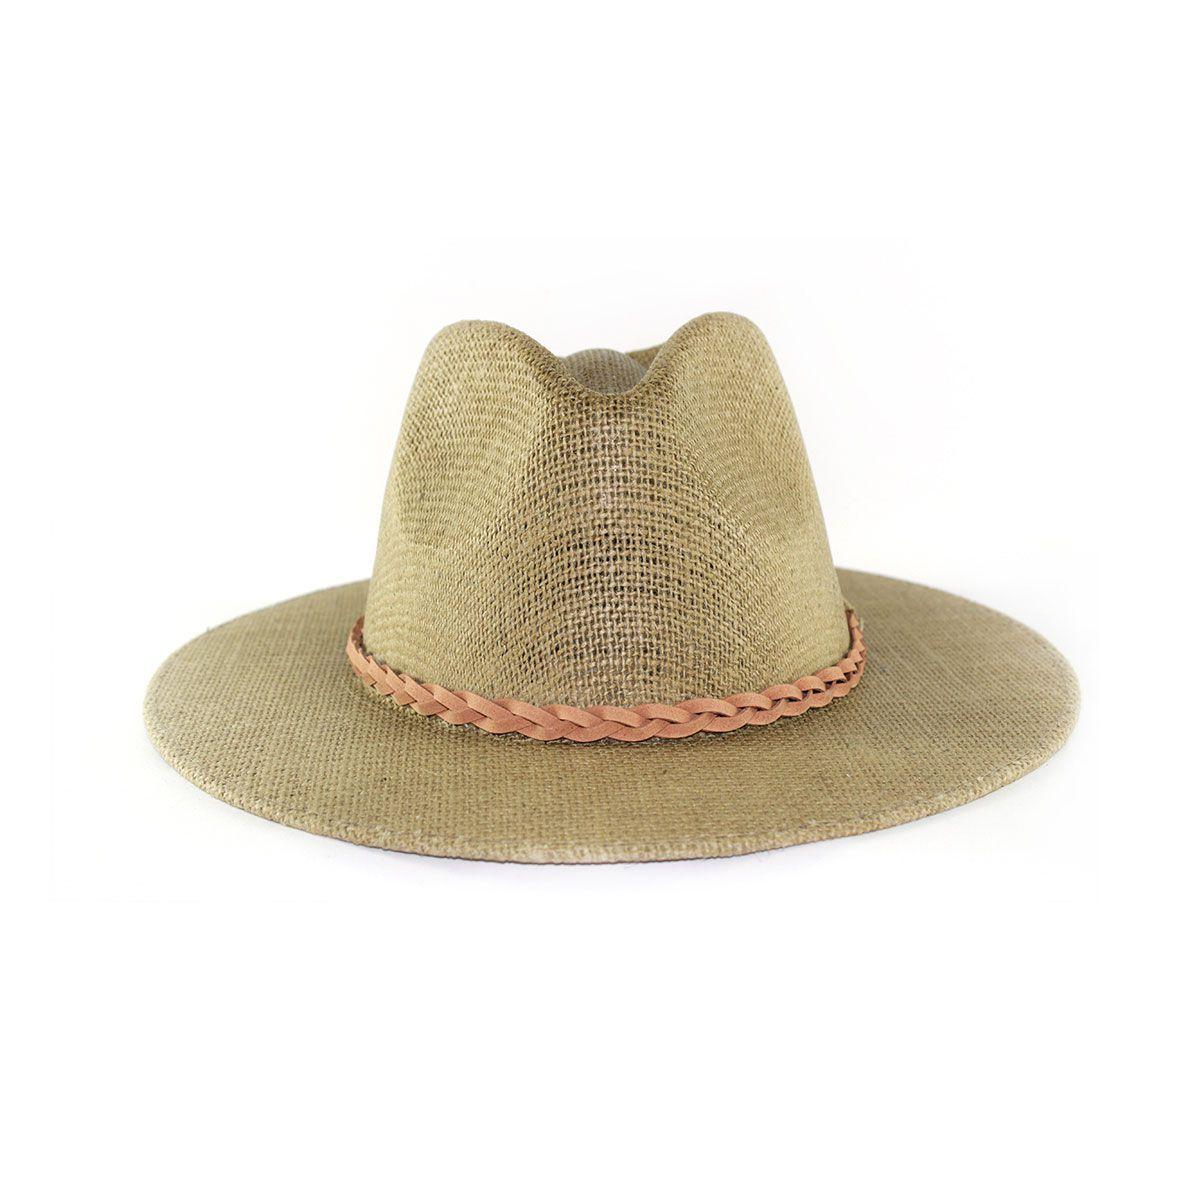 Chapéu Dallas Australiano de Juta Fita Trançada